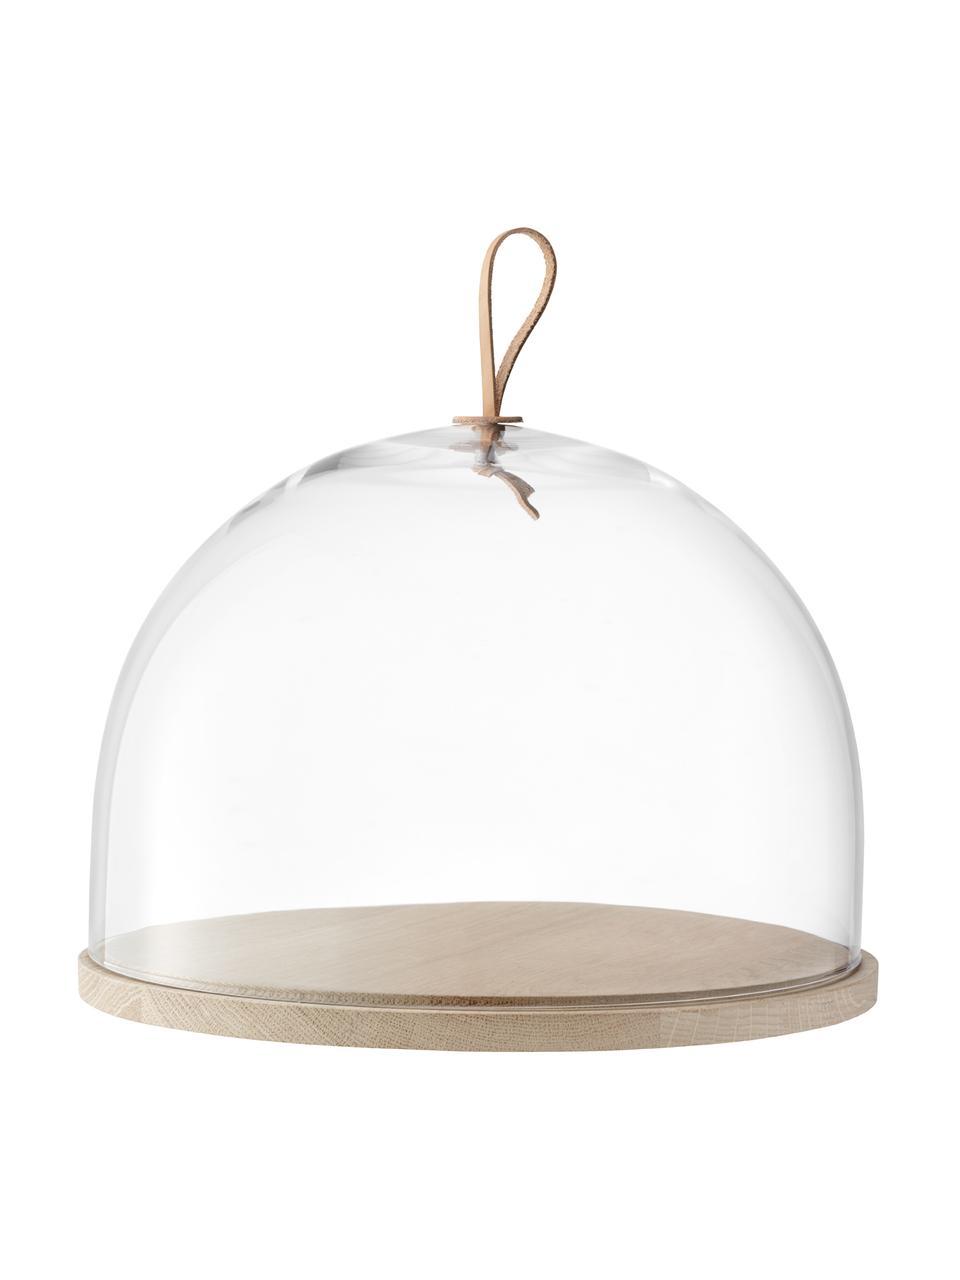 Mondgeblazen stolp Ivalo van glas en hout, Ø 32 cm, Stolp: glas, Transparant, bruin, Ø 32 x H 23 cm